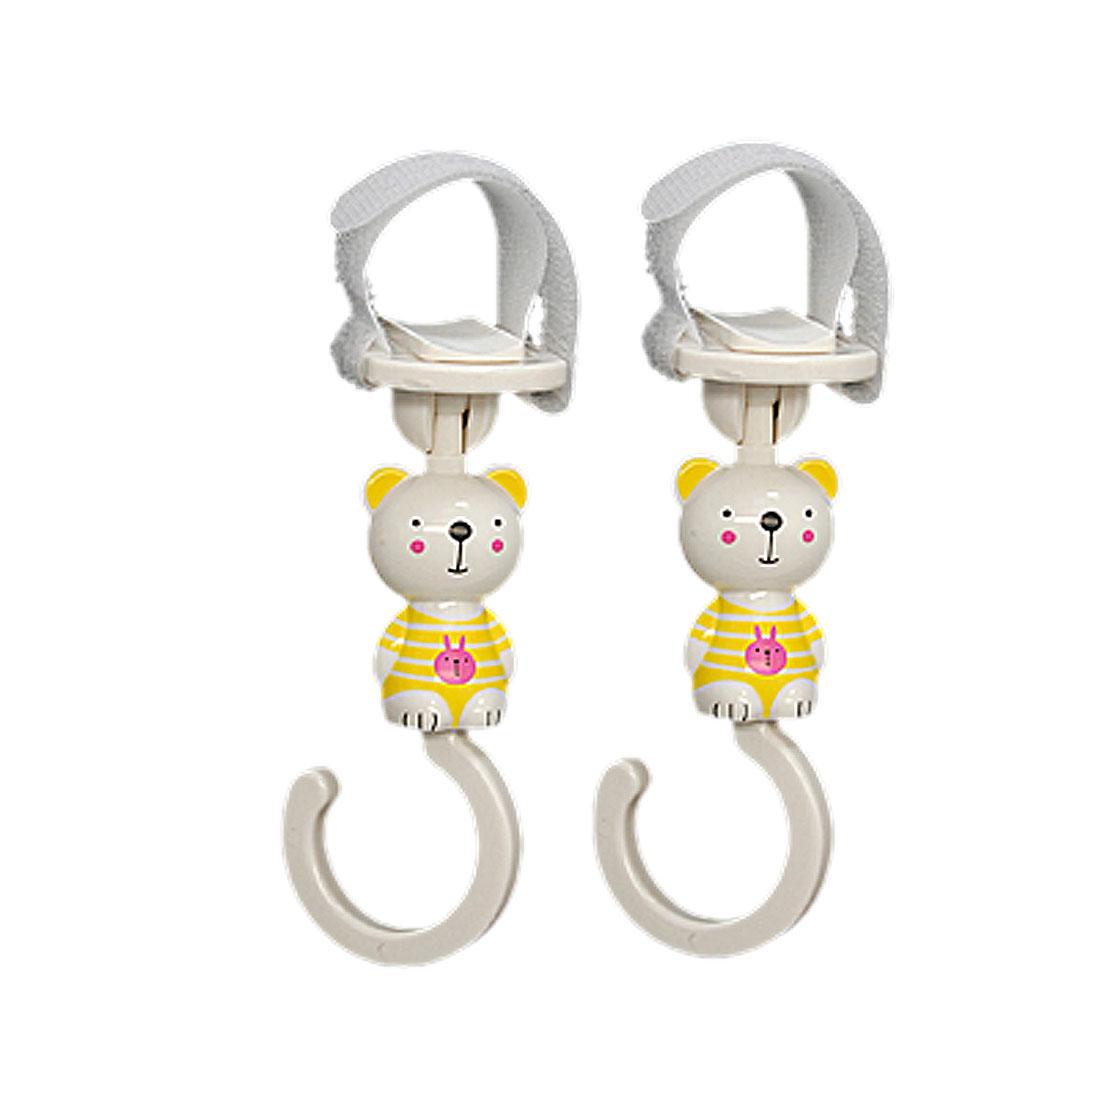 Portable Lovable Cartoon Style Hanger Clasp Hook 2 PCS